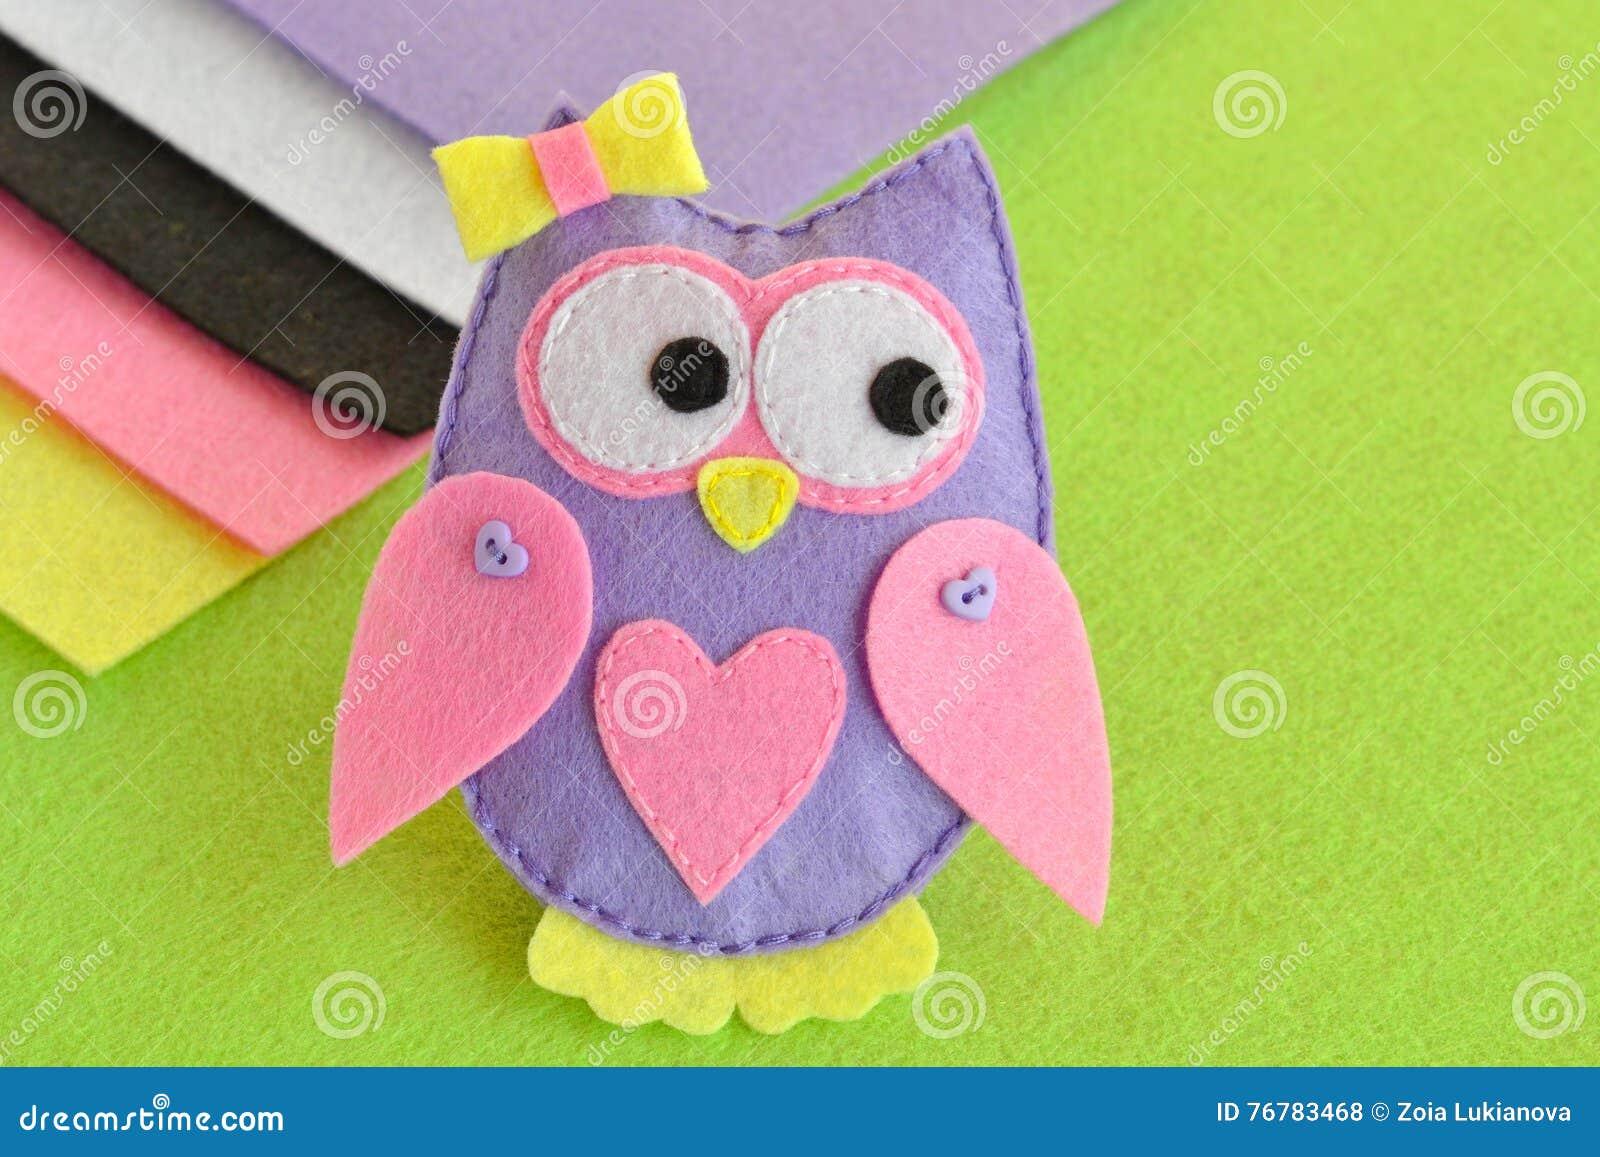 Soft Toy Felt Owl Sewing Handmade Crafts Stock Photo Image Of